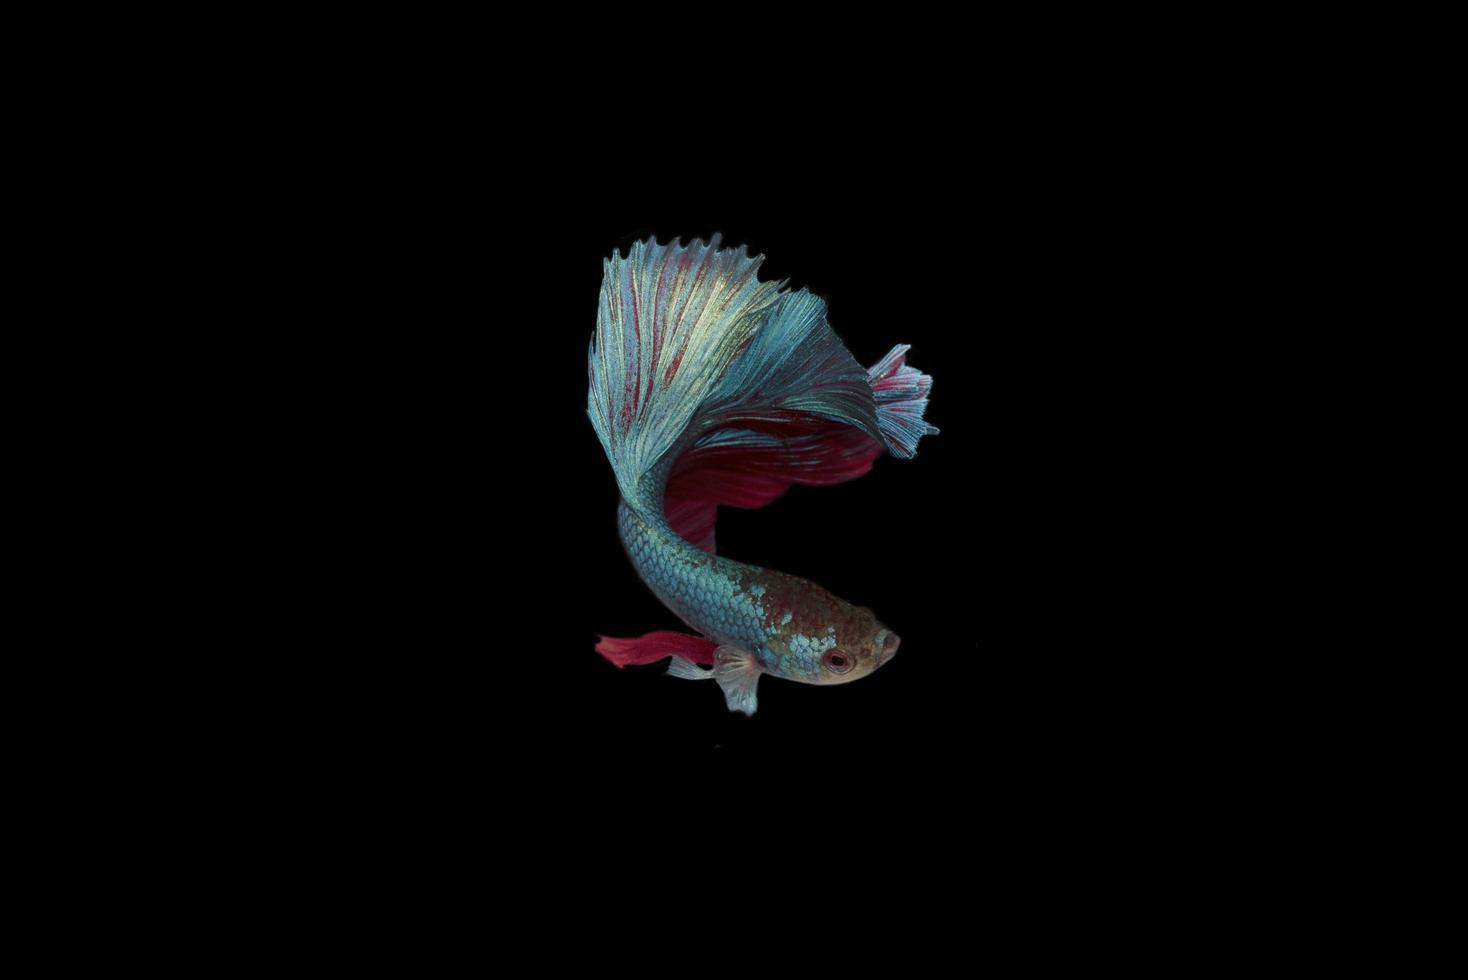 siamese halvmånad betta slåssfisk foto